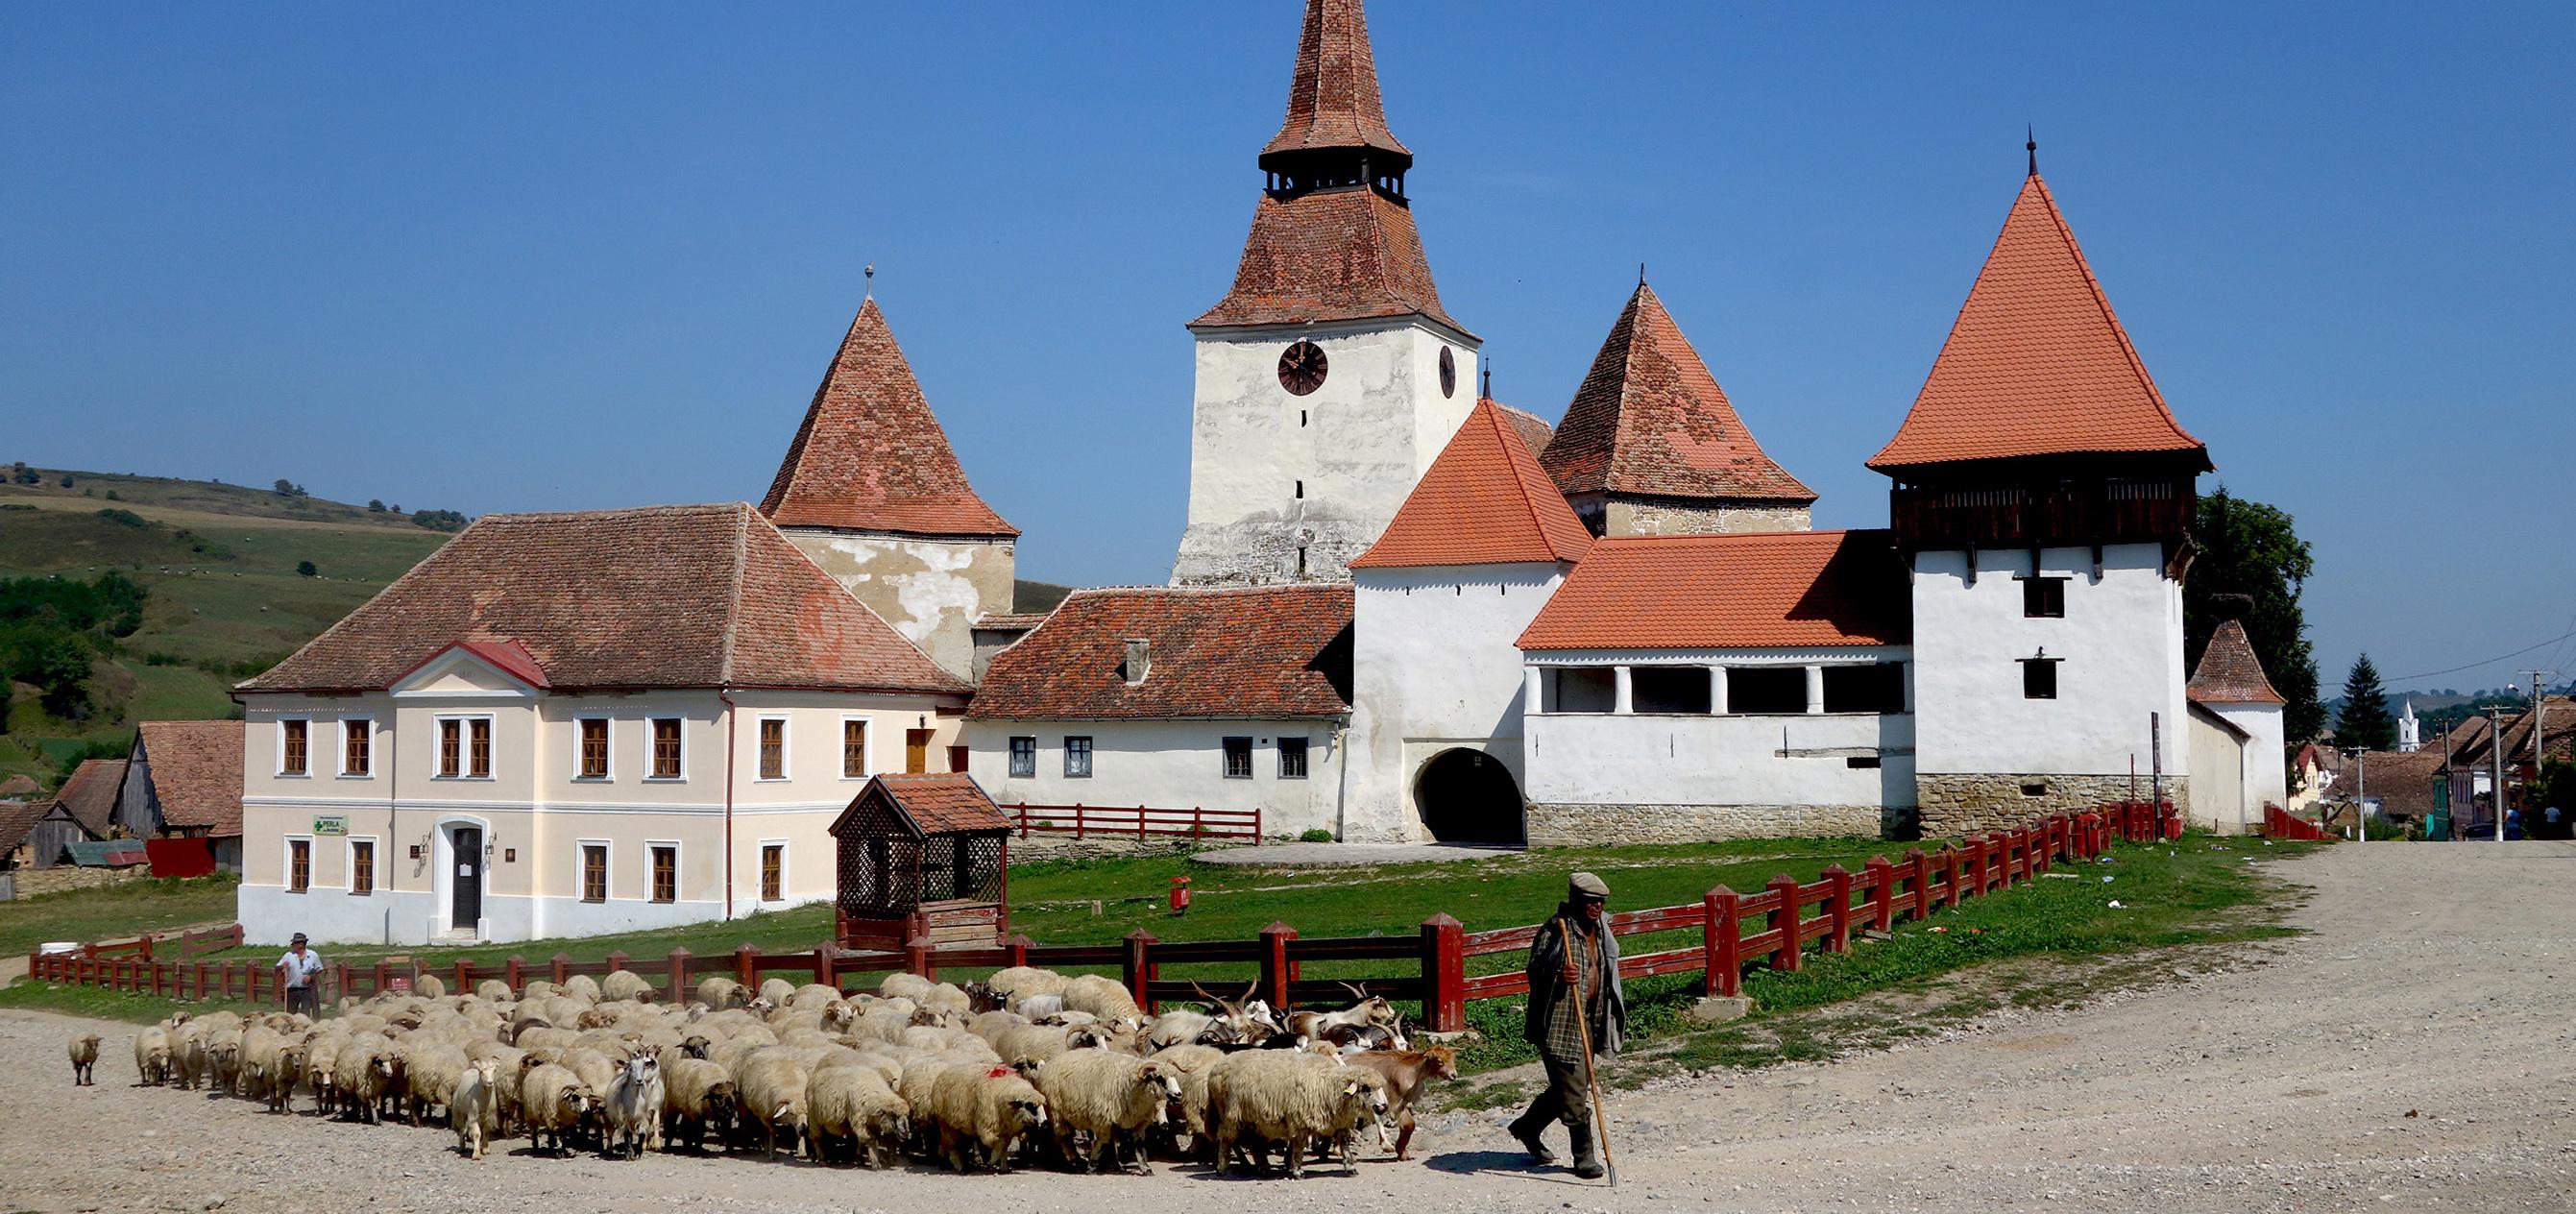 'Saxon' Village of Archita